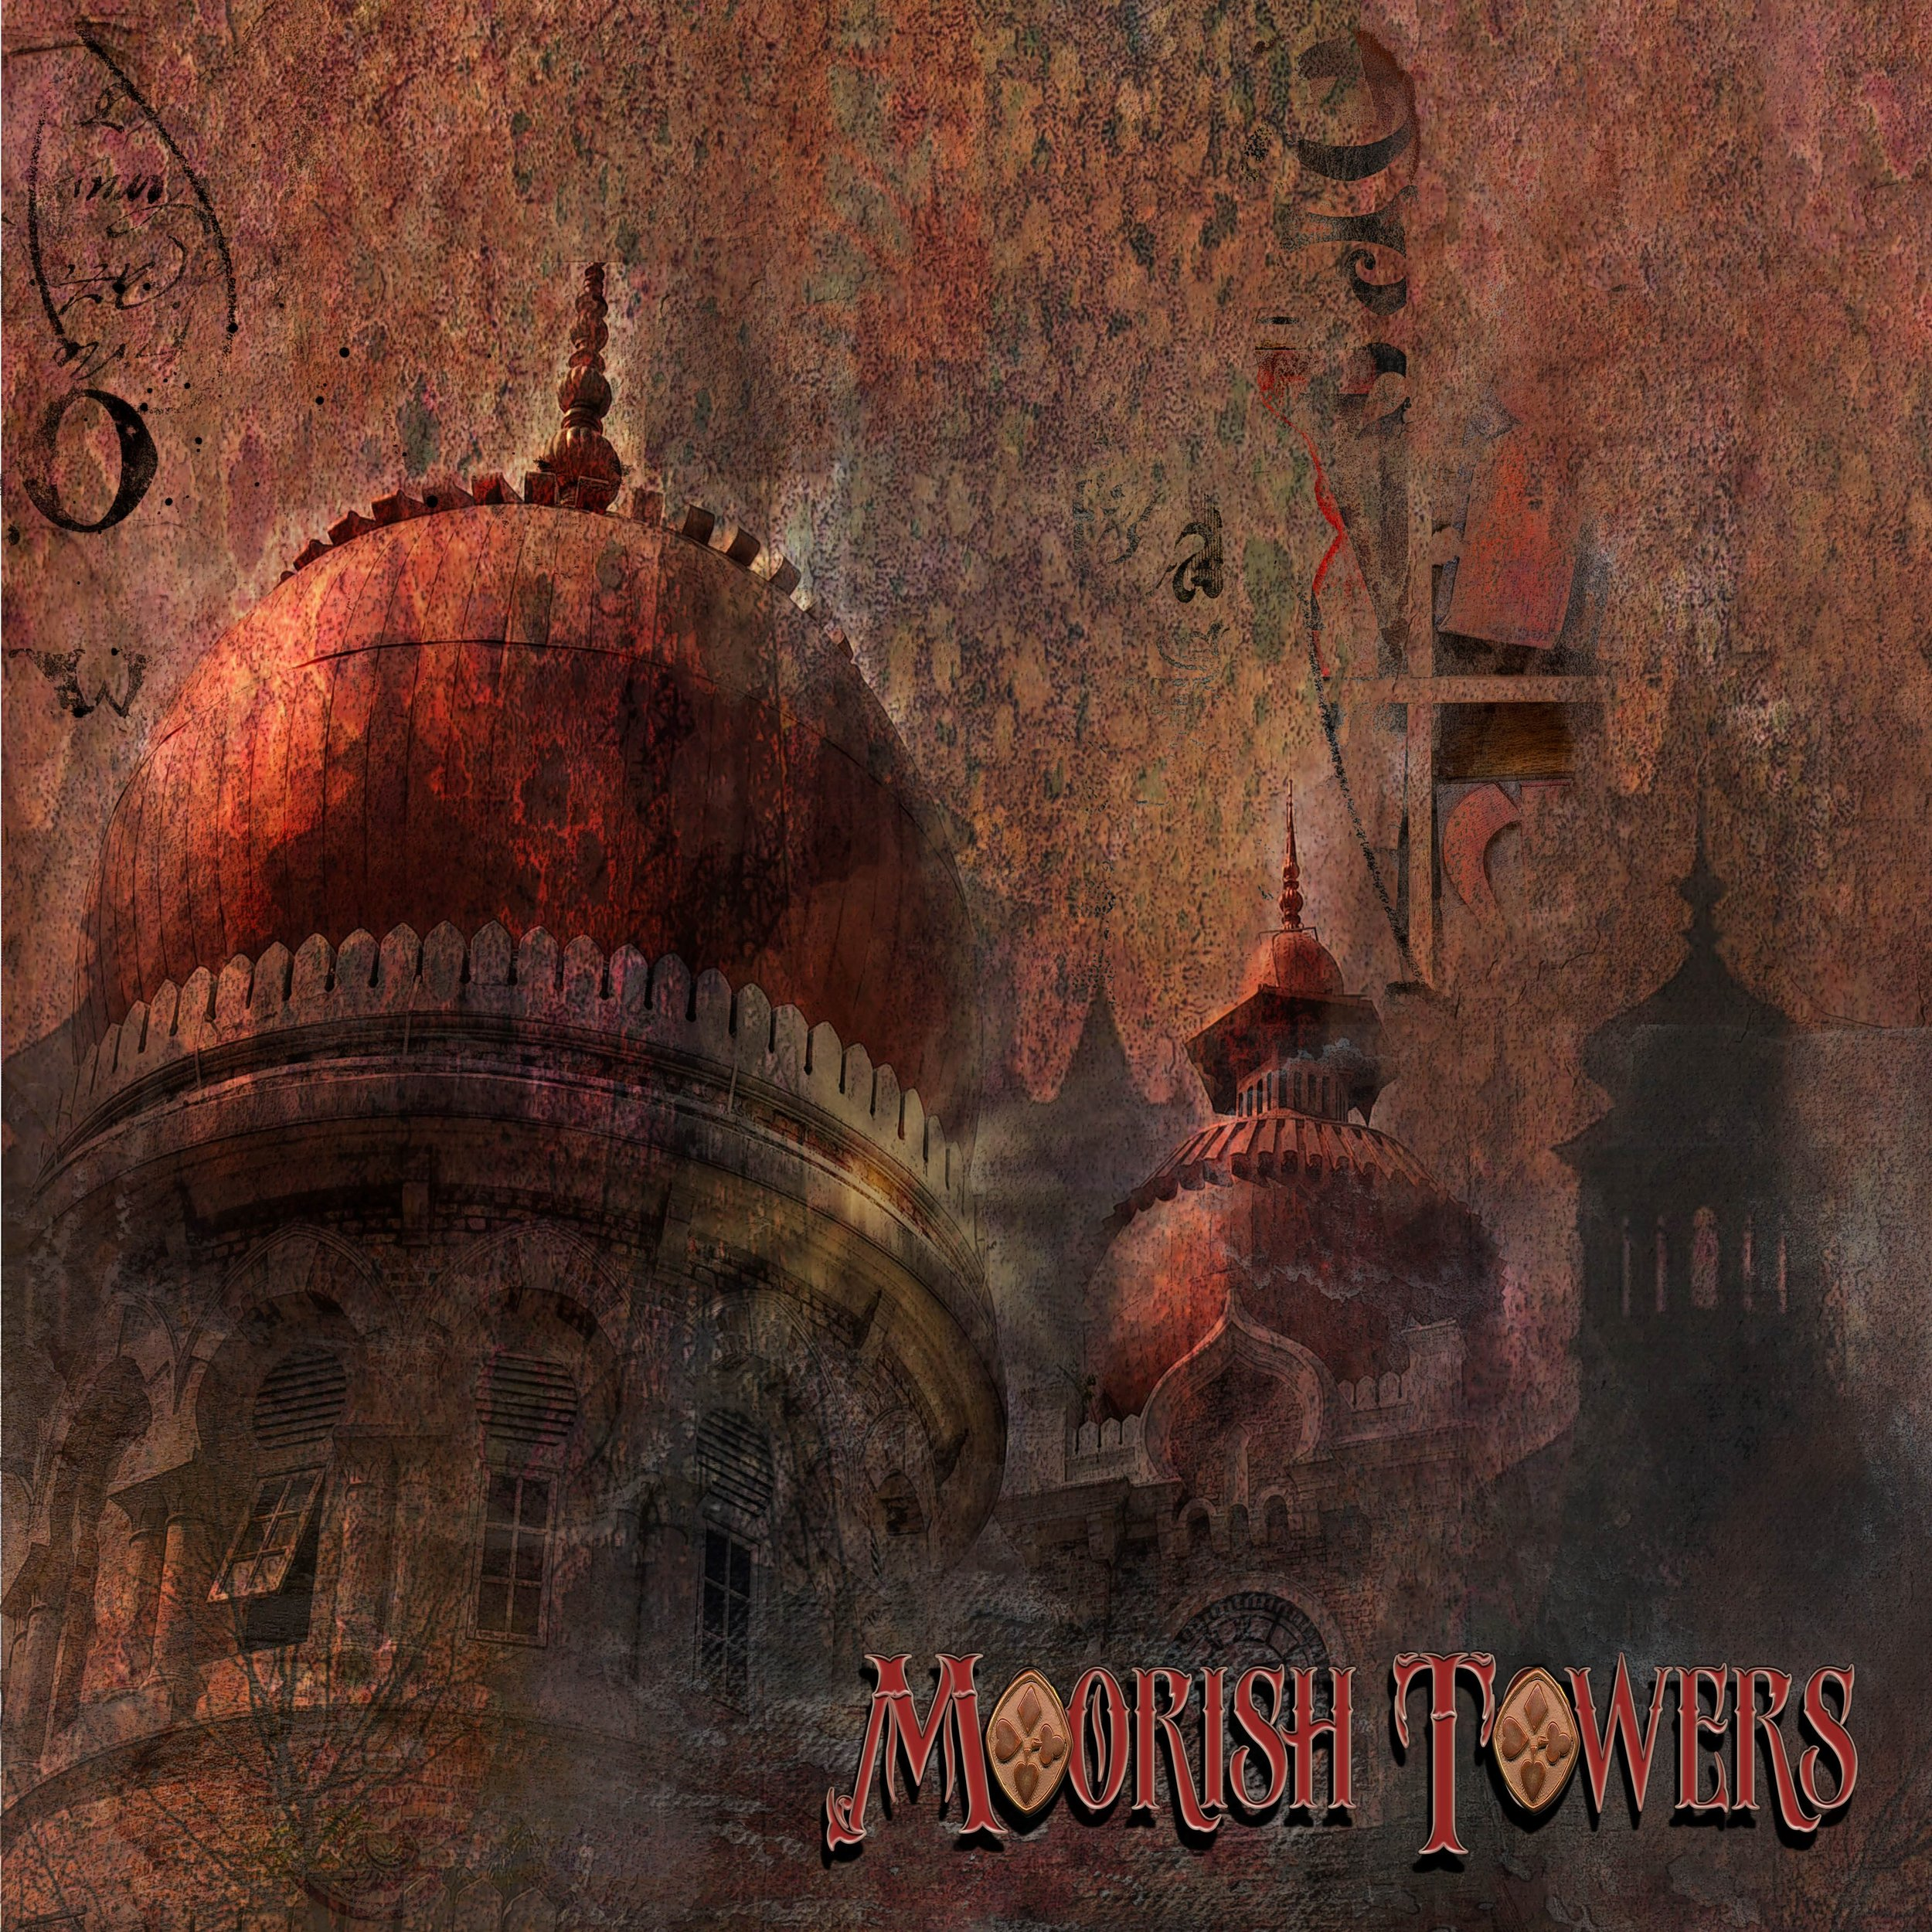 Moorish Towers- Christy RePinec